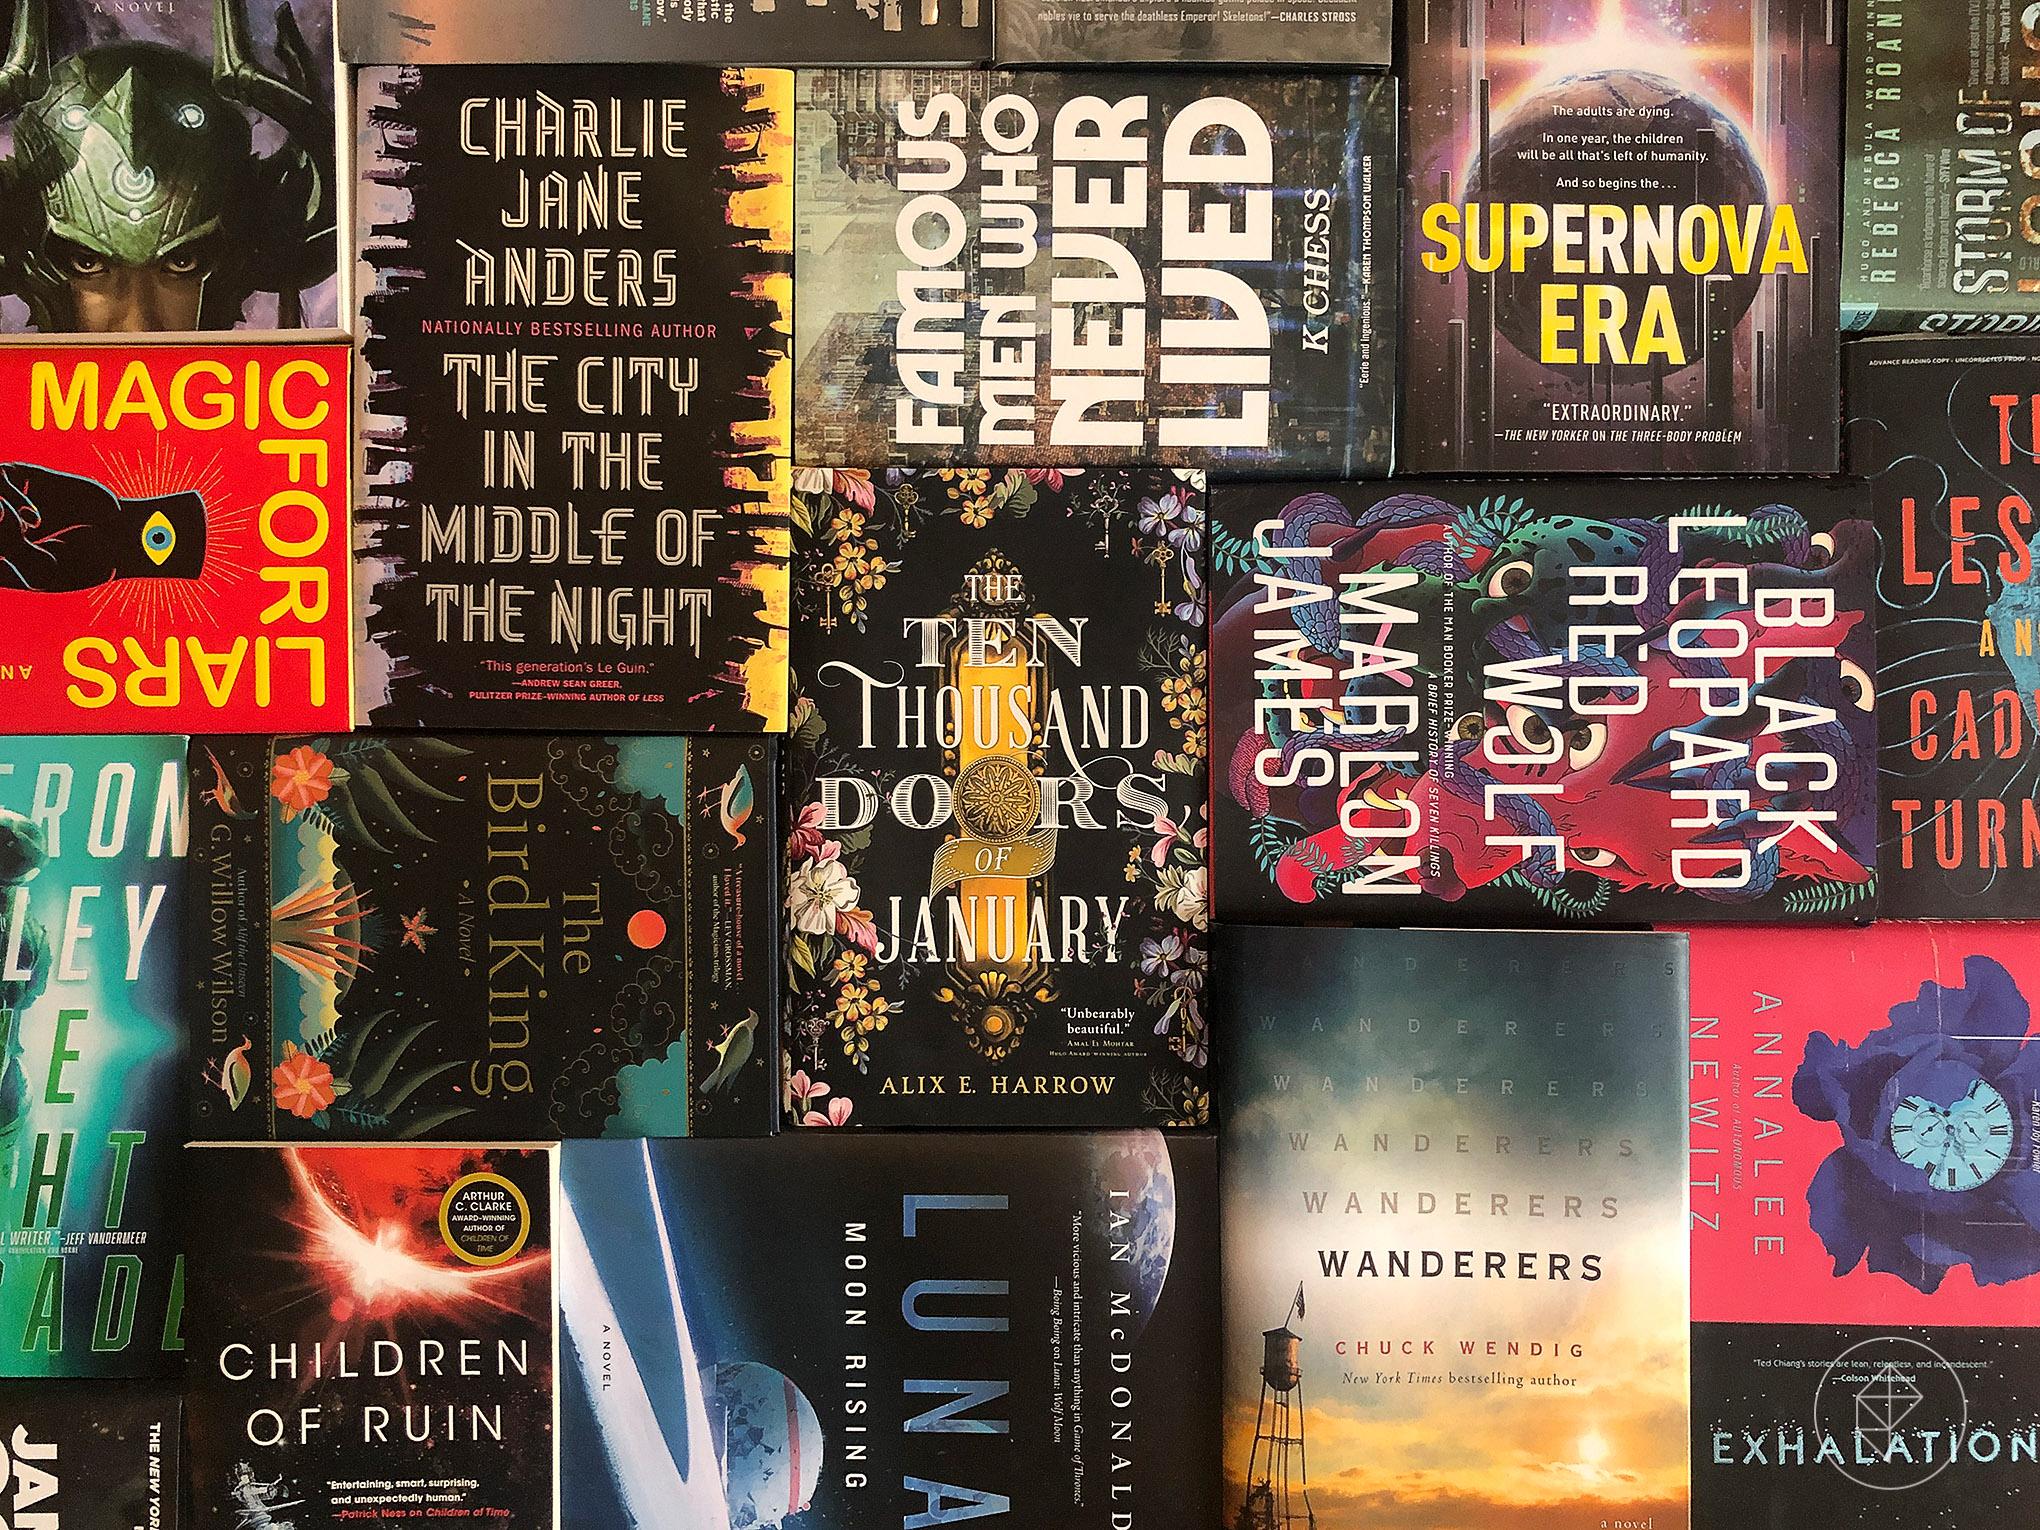 Graphic arrangement of numerous science fiction book covers